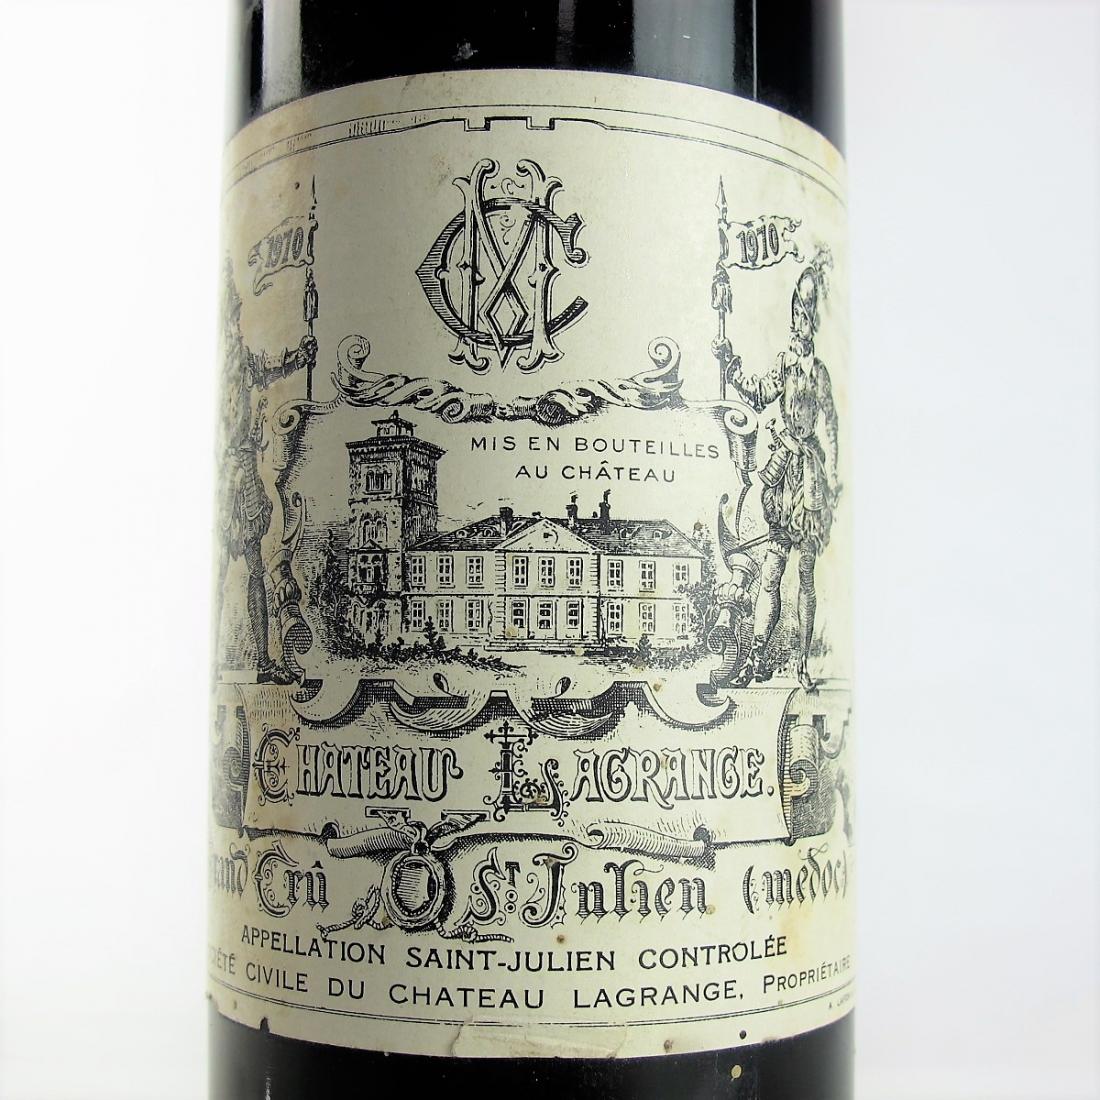 Ch. Lagrange 1970 Saint-Julien 3eme-Cru